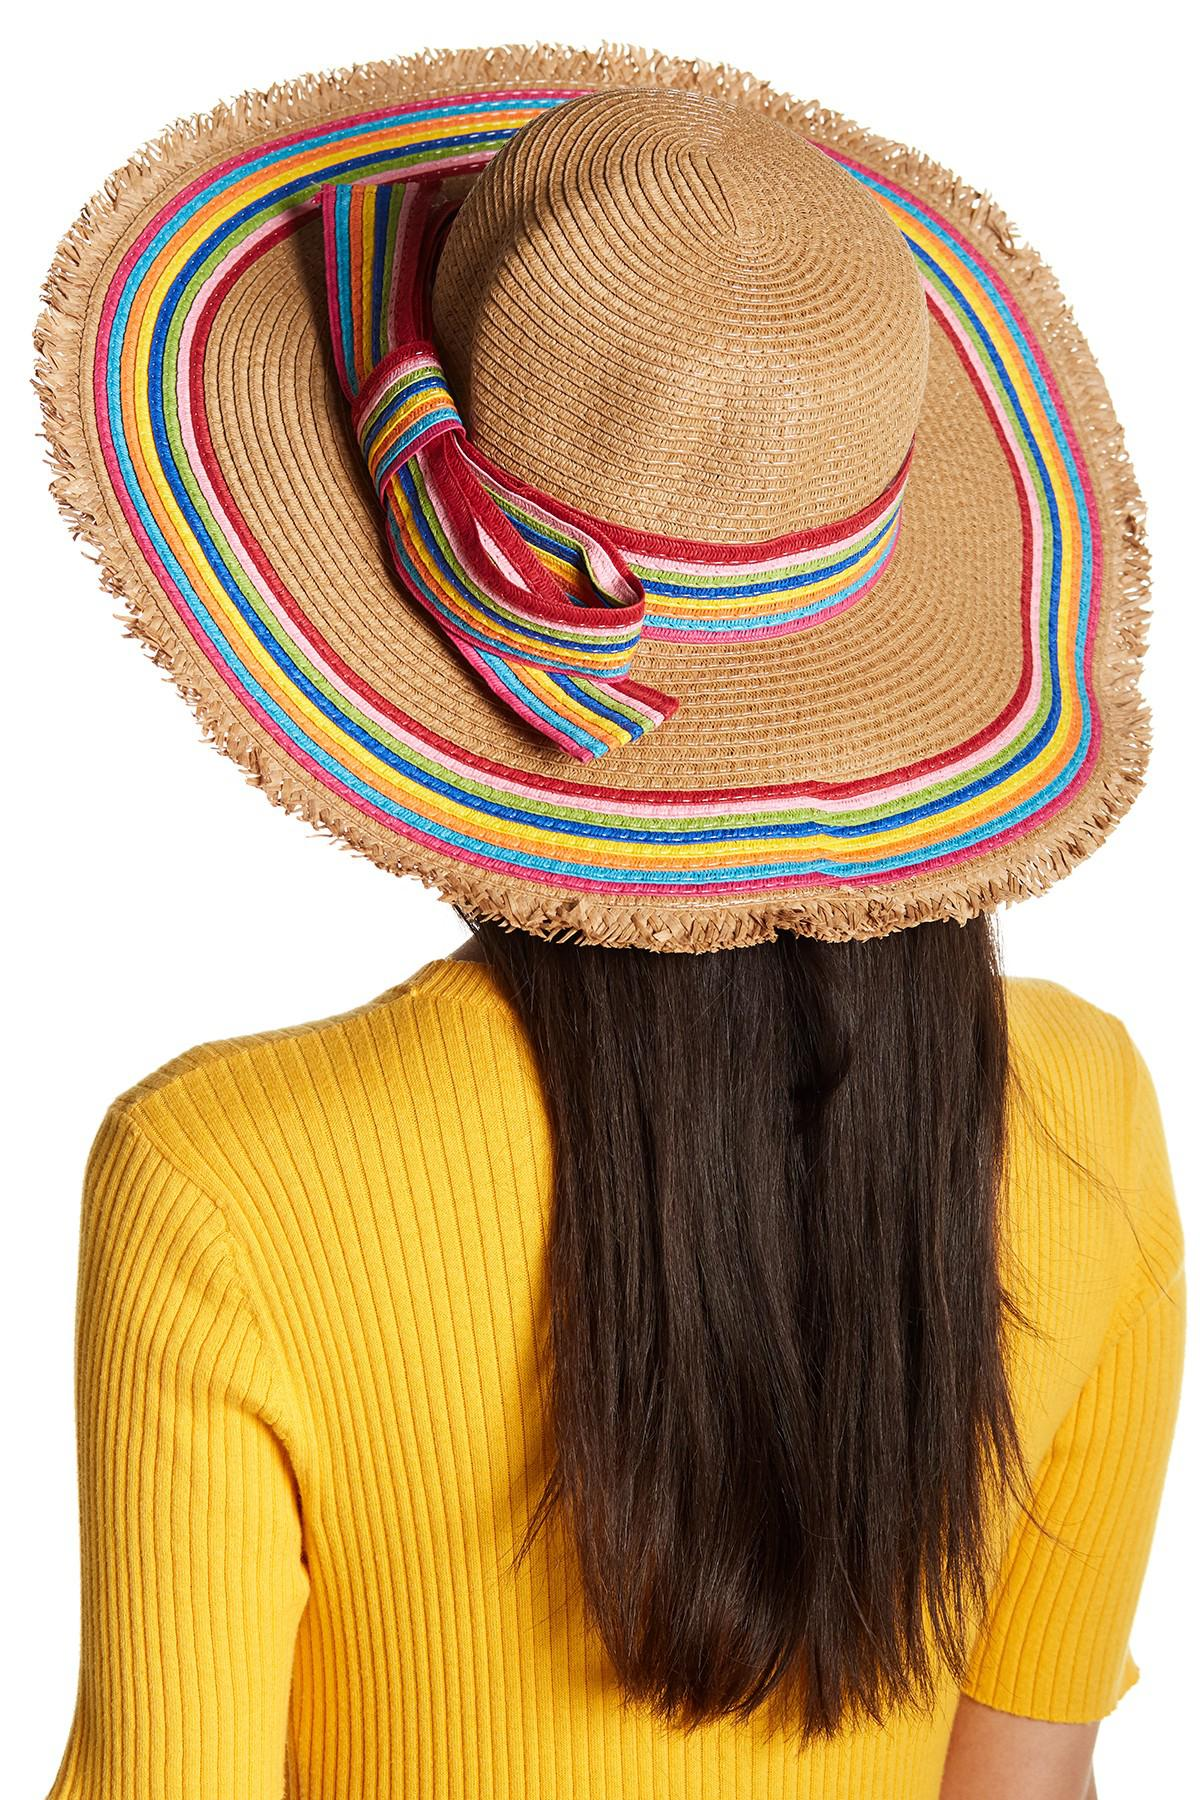 Lyst - Betsey Johnson Rainbow Raw Edge Floppy Hat 2e0bdee54bc